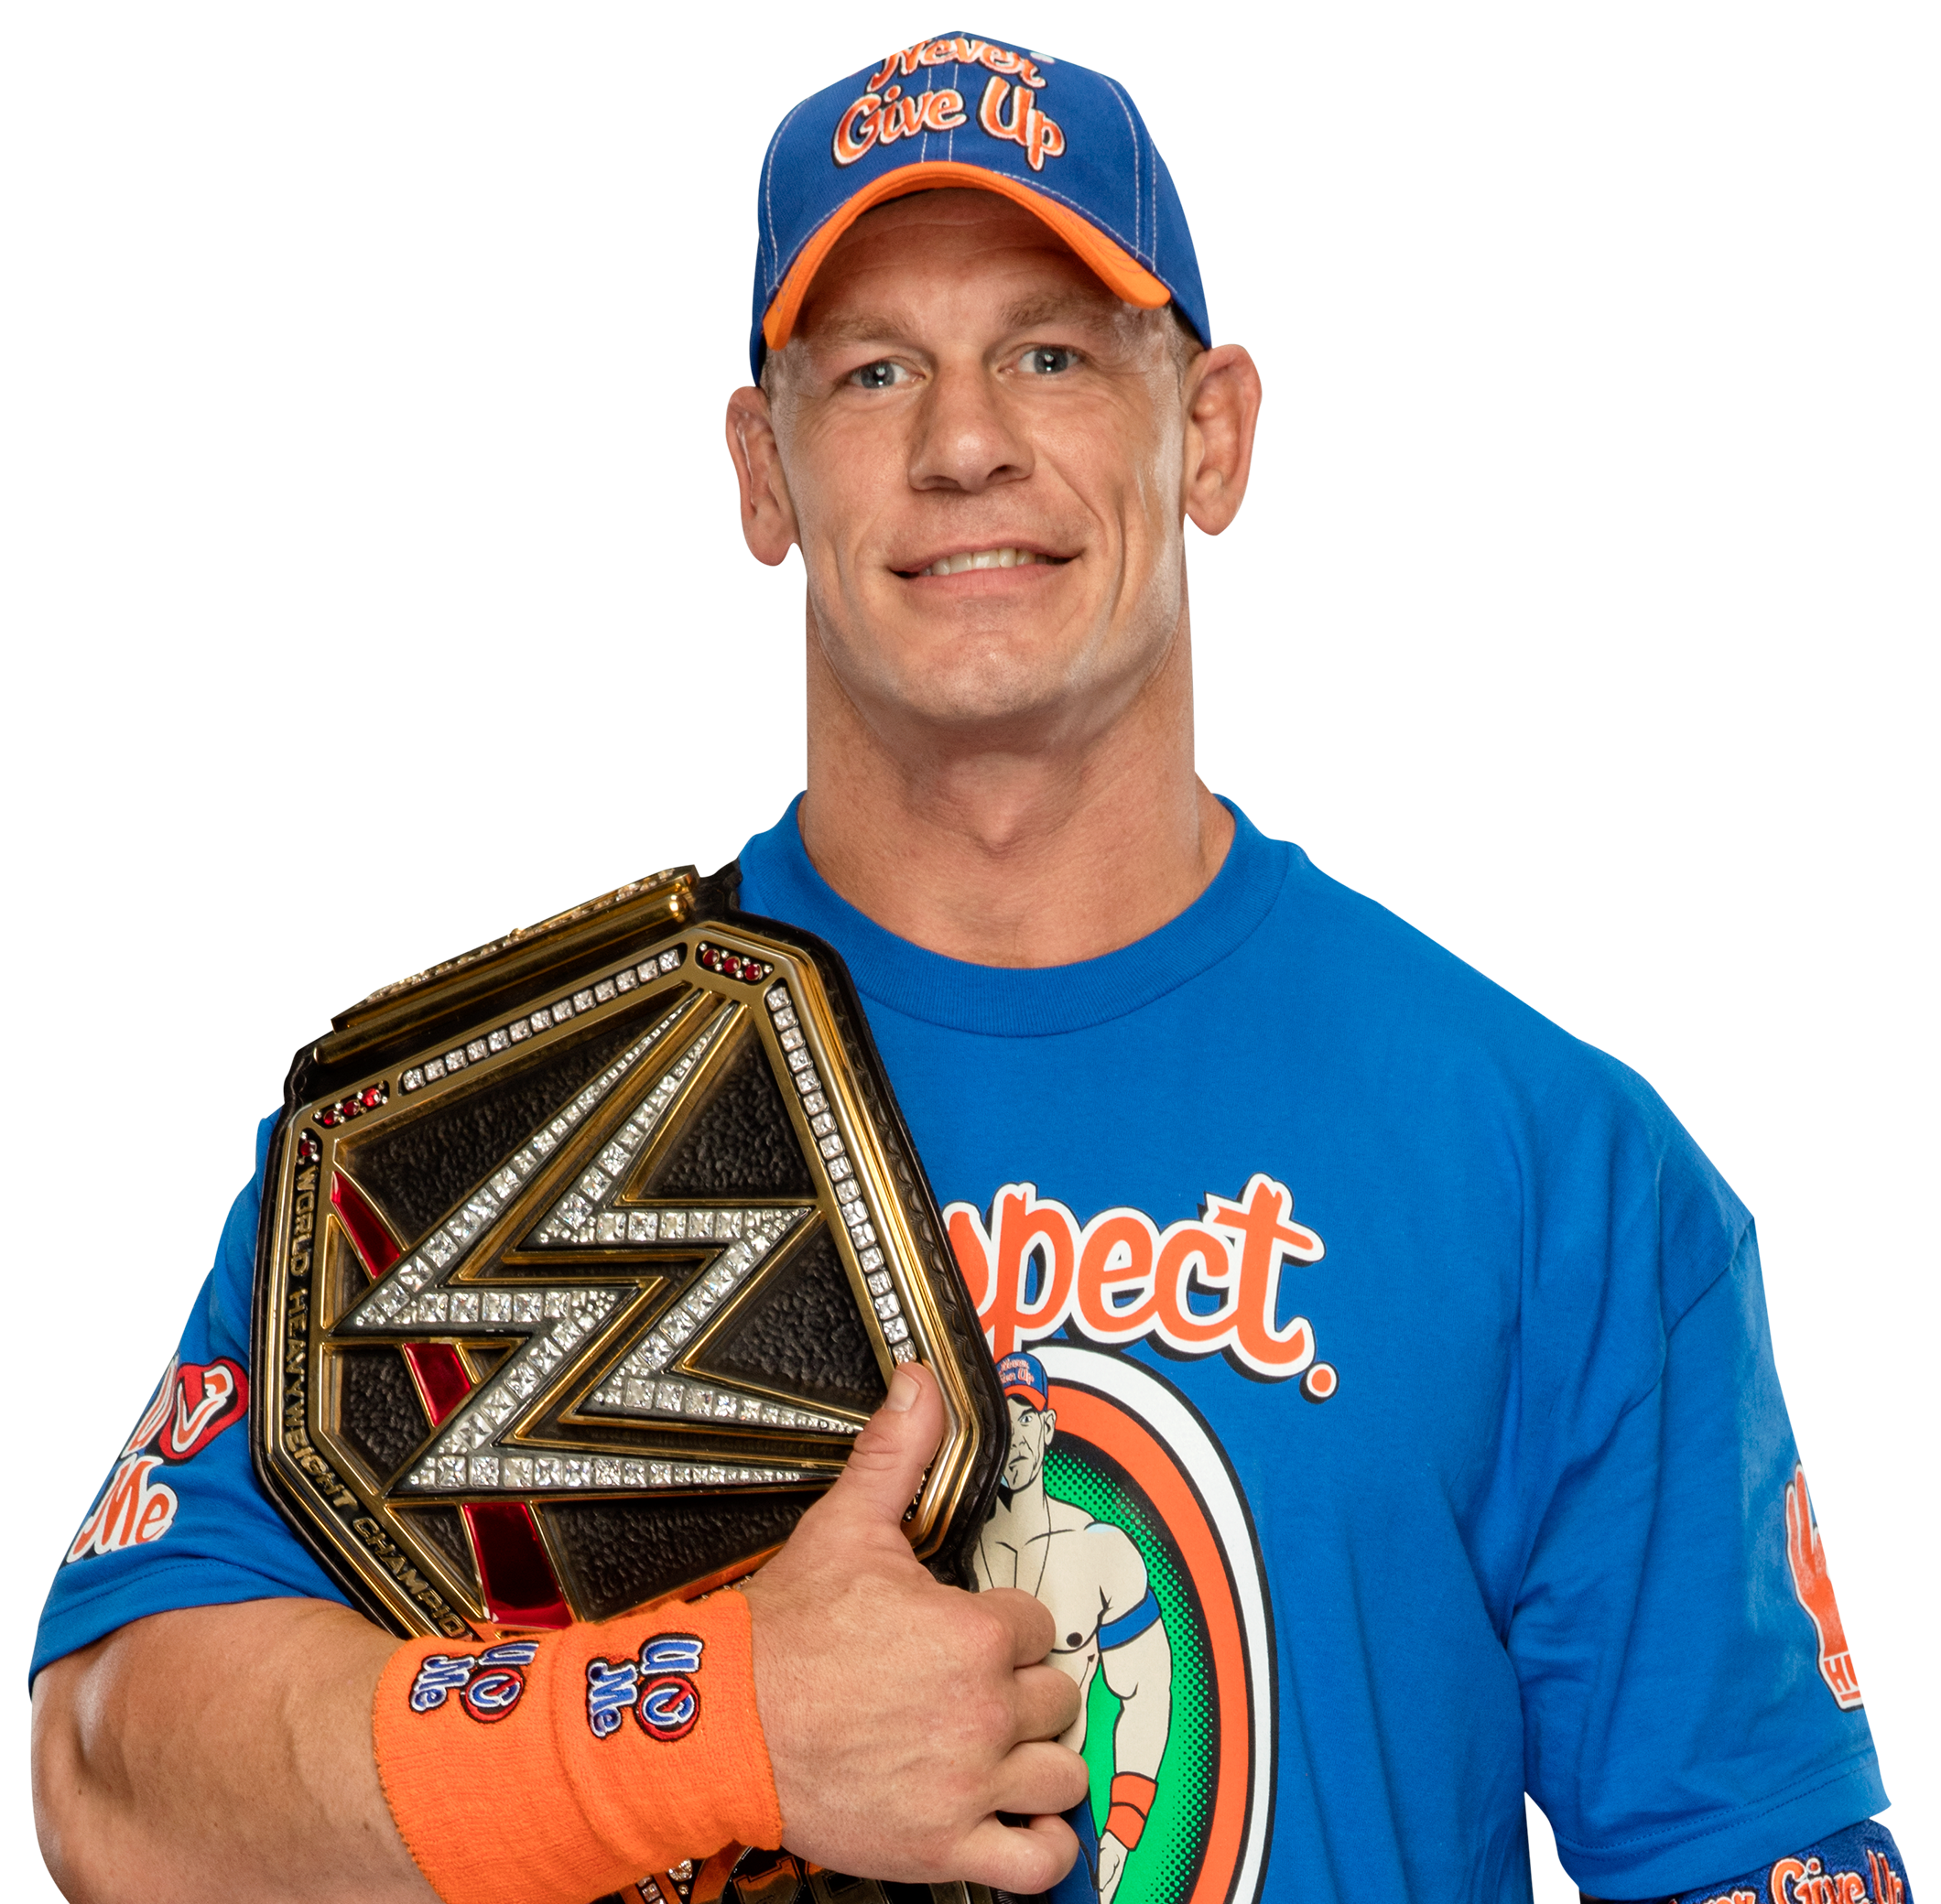 John Cena WWE Champion 2017 by Nibble-T on DeviantArt